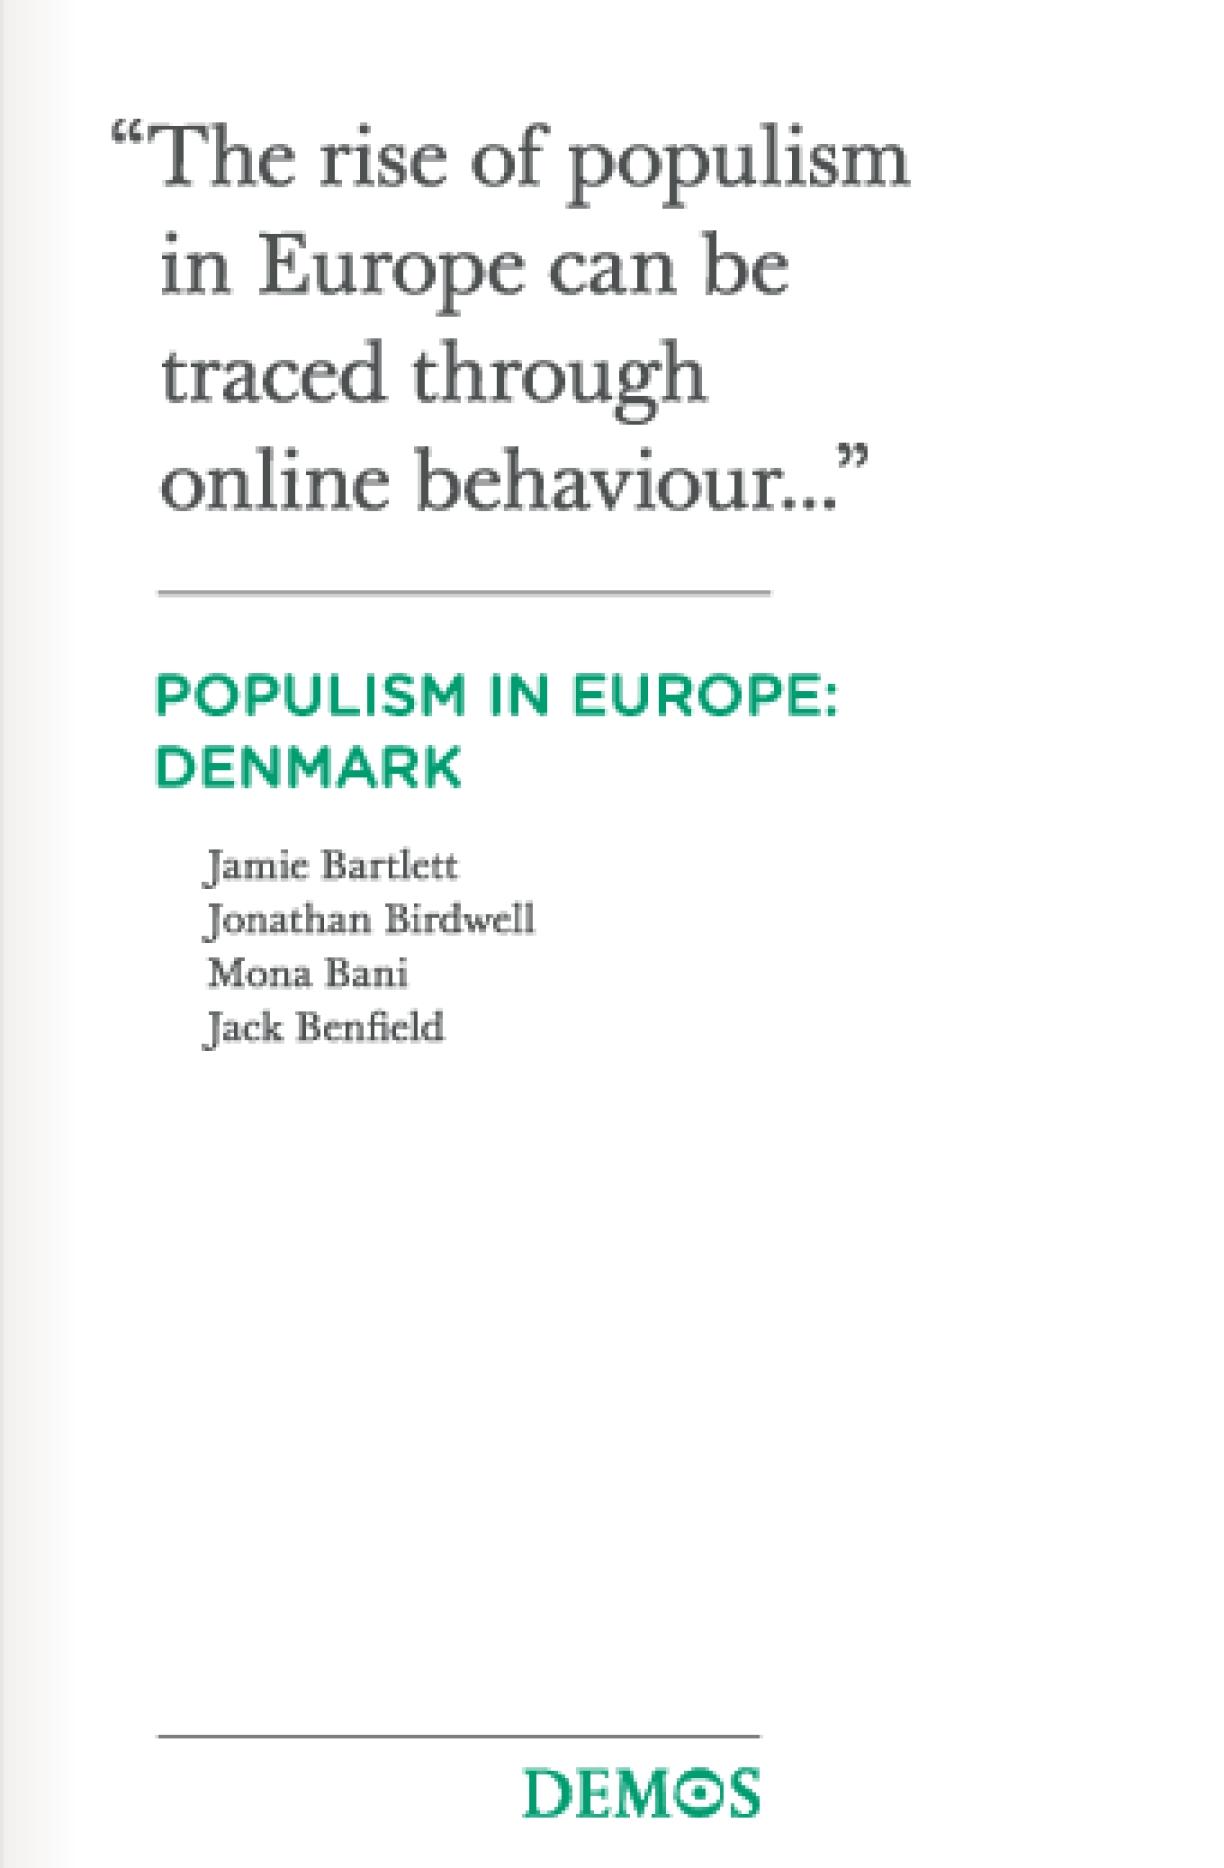 Populism in Europe: Denmark